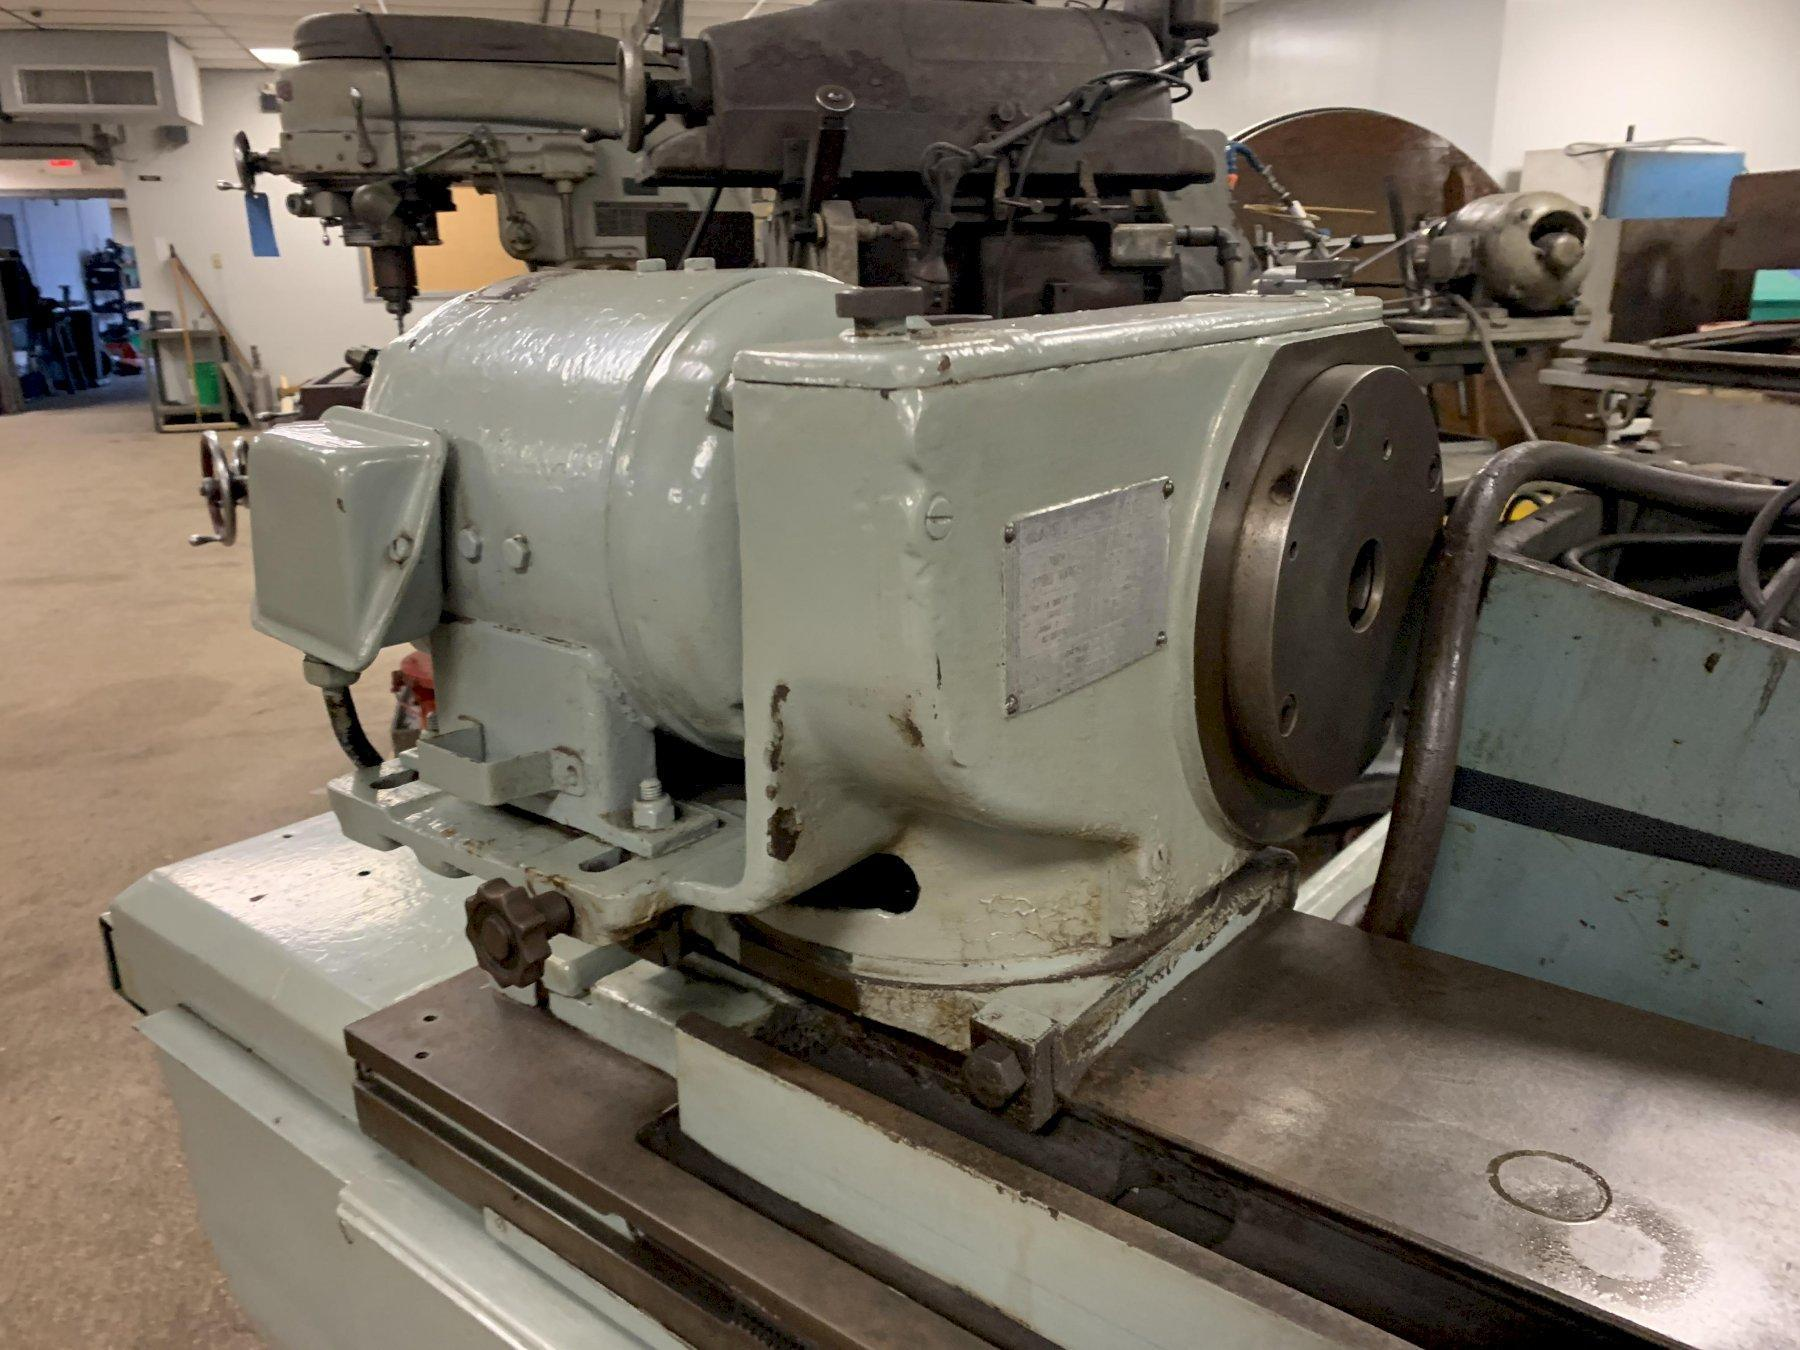 "14"" x 40"" Brown & Sharpe No. 3 Universal Cylindrical Grinder, S/N 521-3-64."